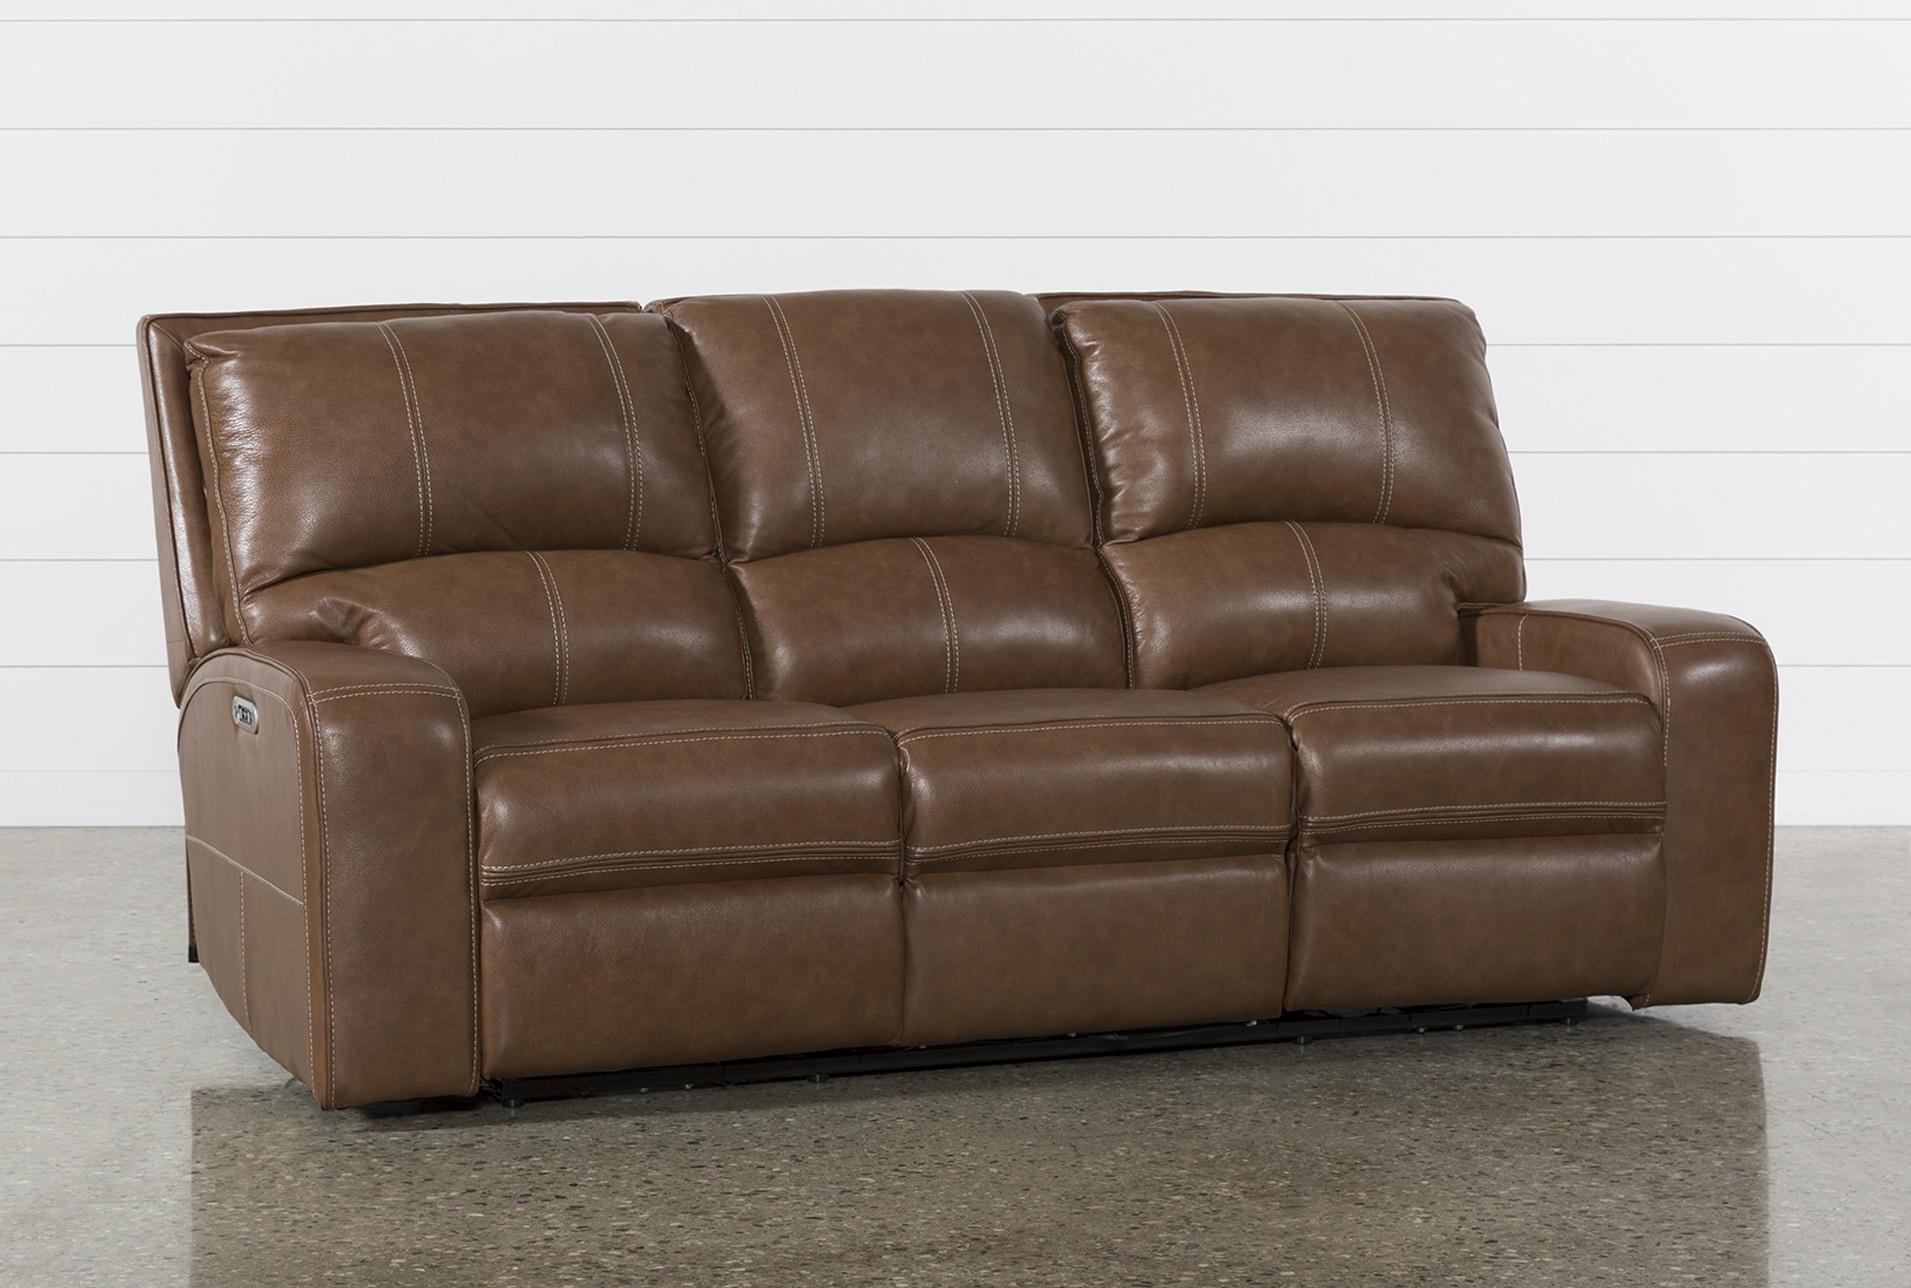 Clyde Saddle Leather Power Reclining Sofa W Power Headrest Usb